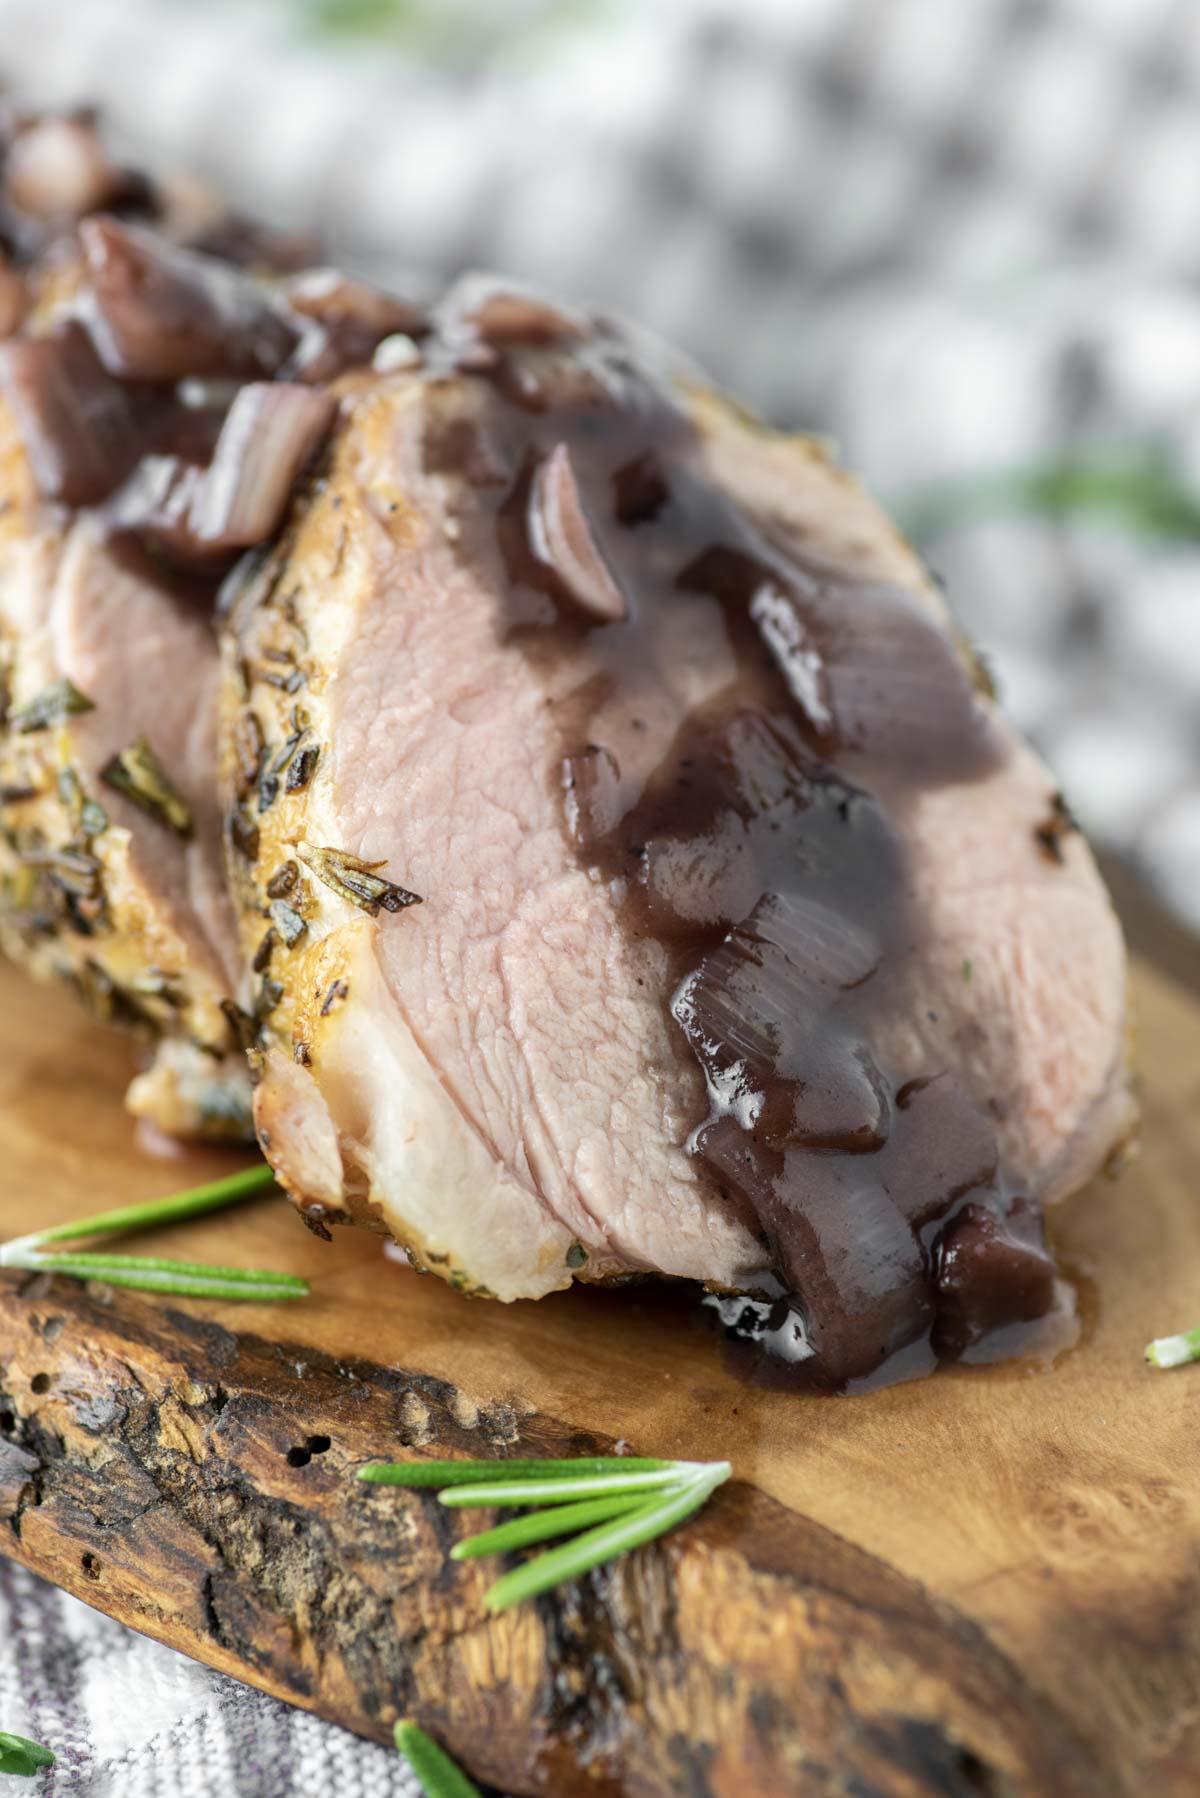 sliced pork tenderloin on wood board with red wine sauce